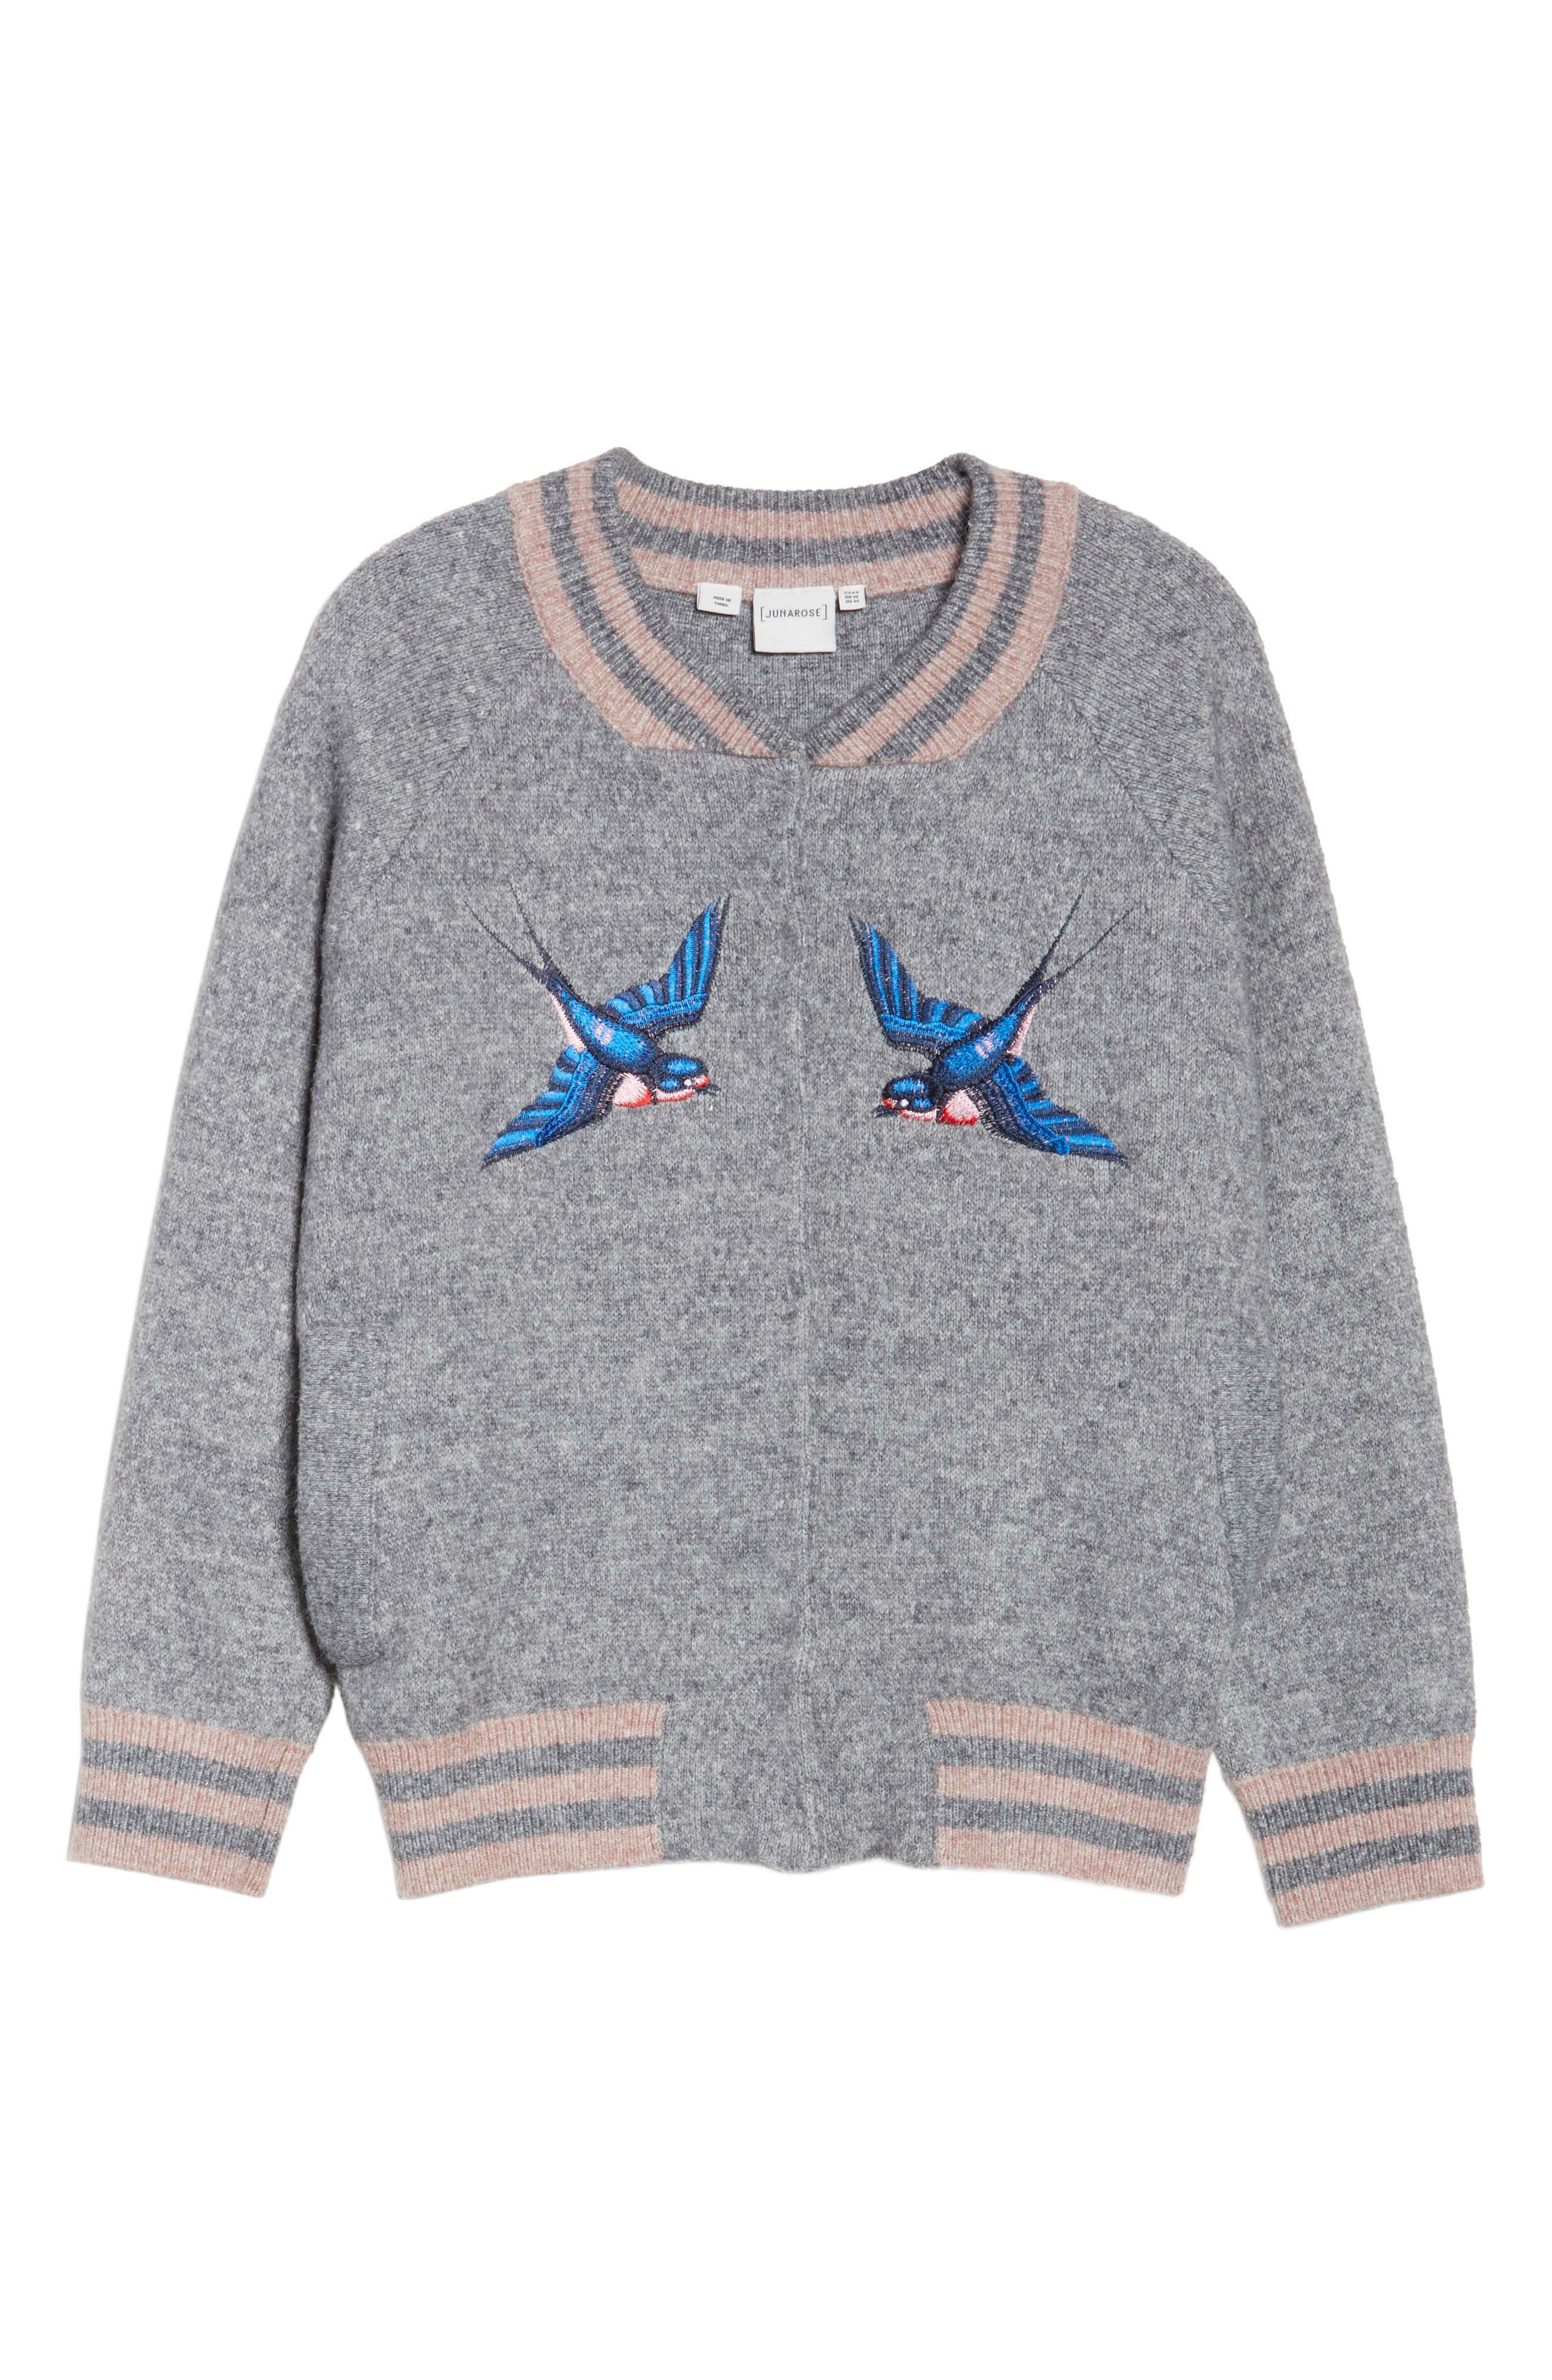 Zanja Embroidered Knit Bomber Jacket,                             Alternate thumbnail 5, color,                             034